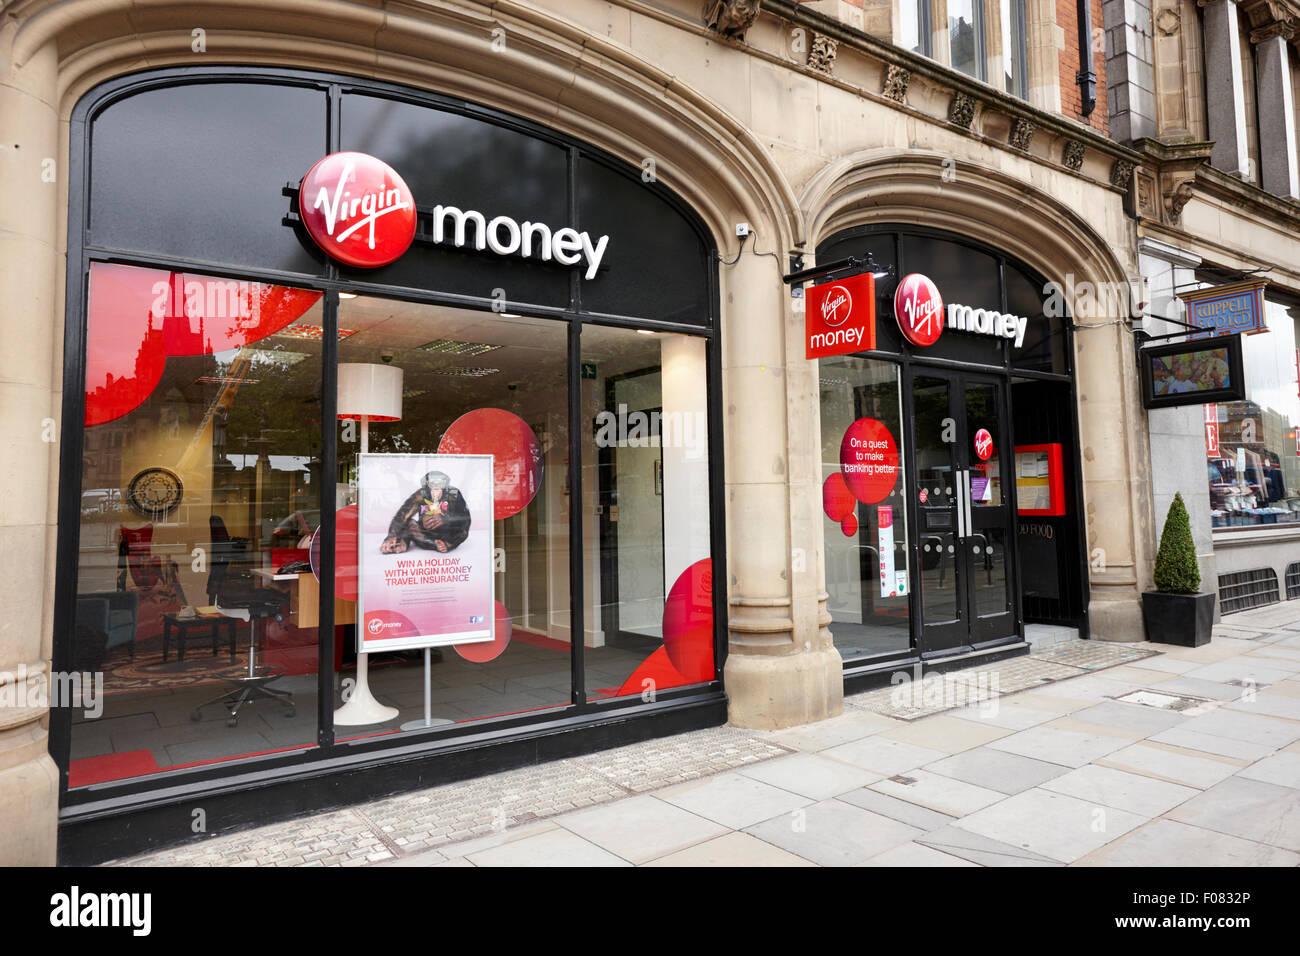 Payday advance loans las vegas nv image 6